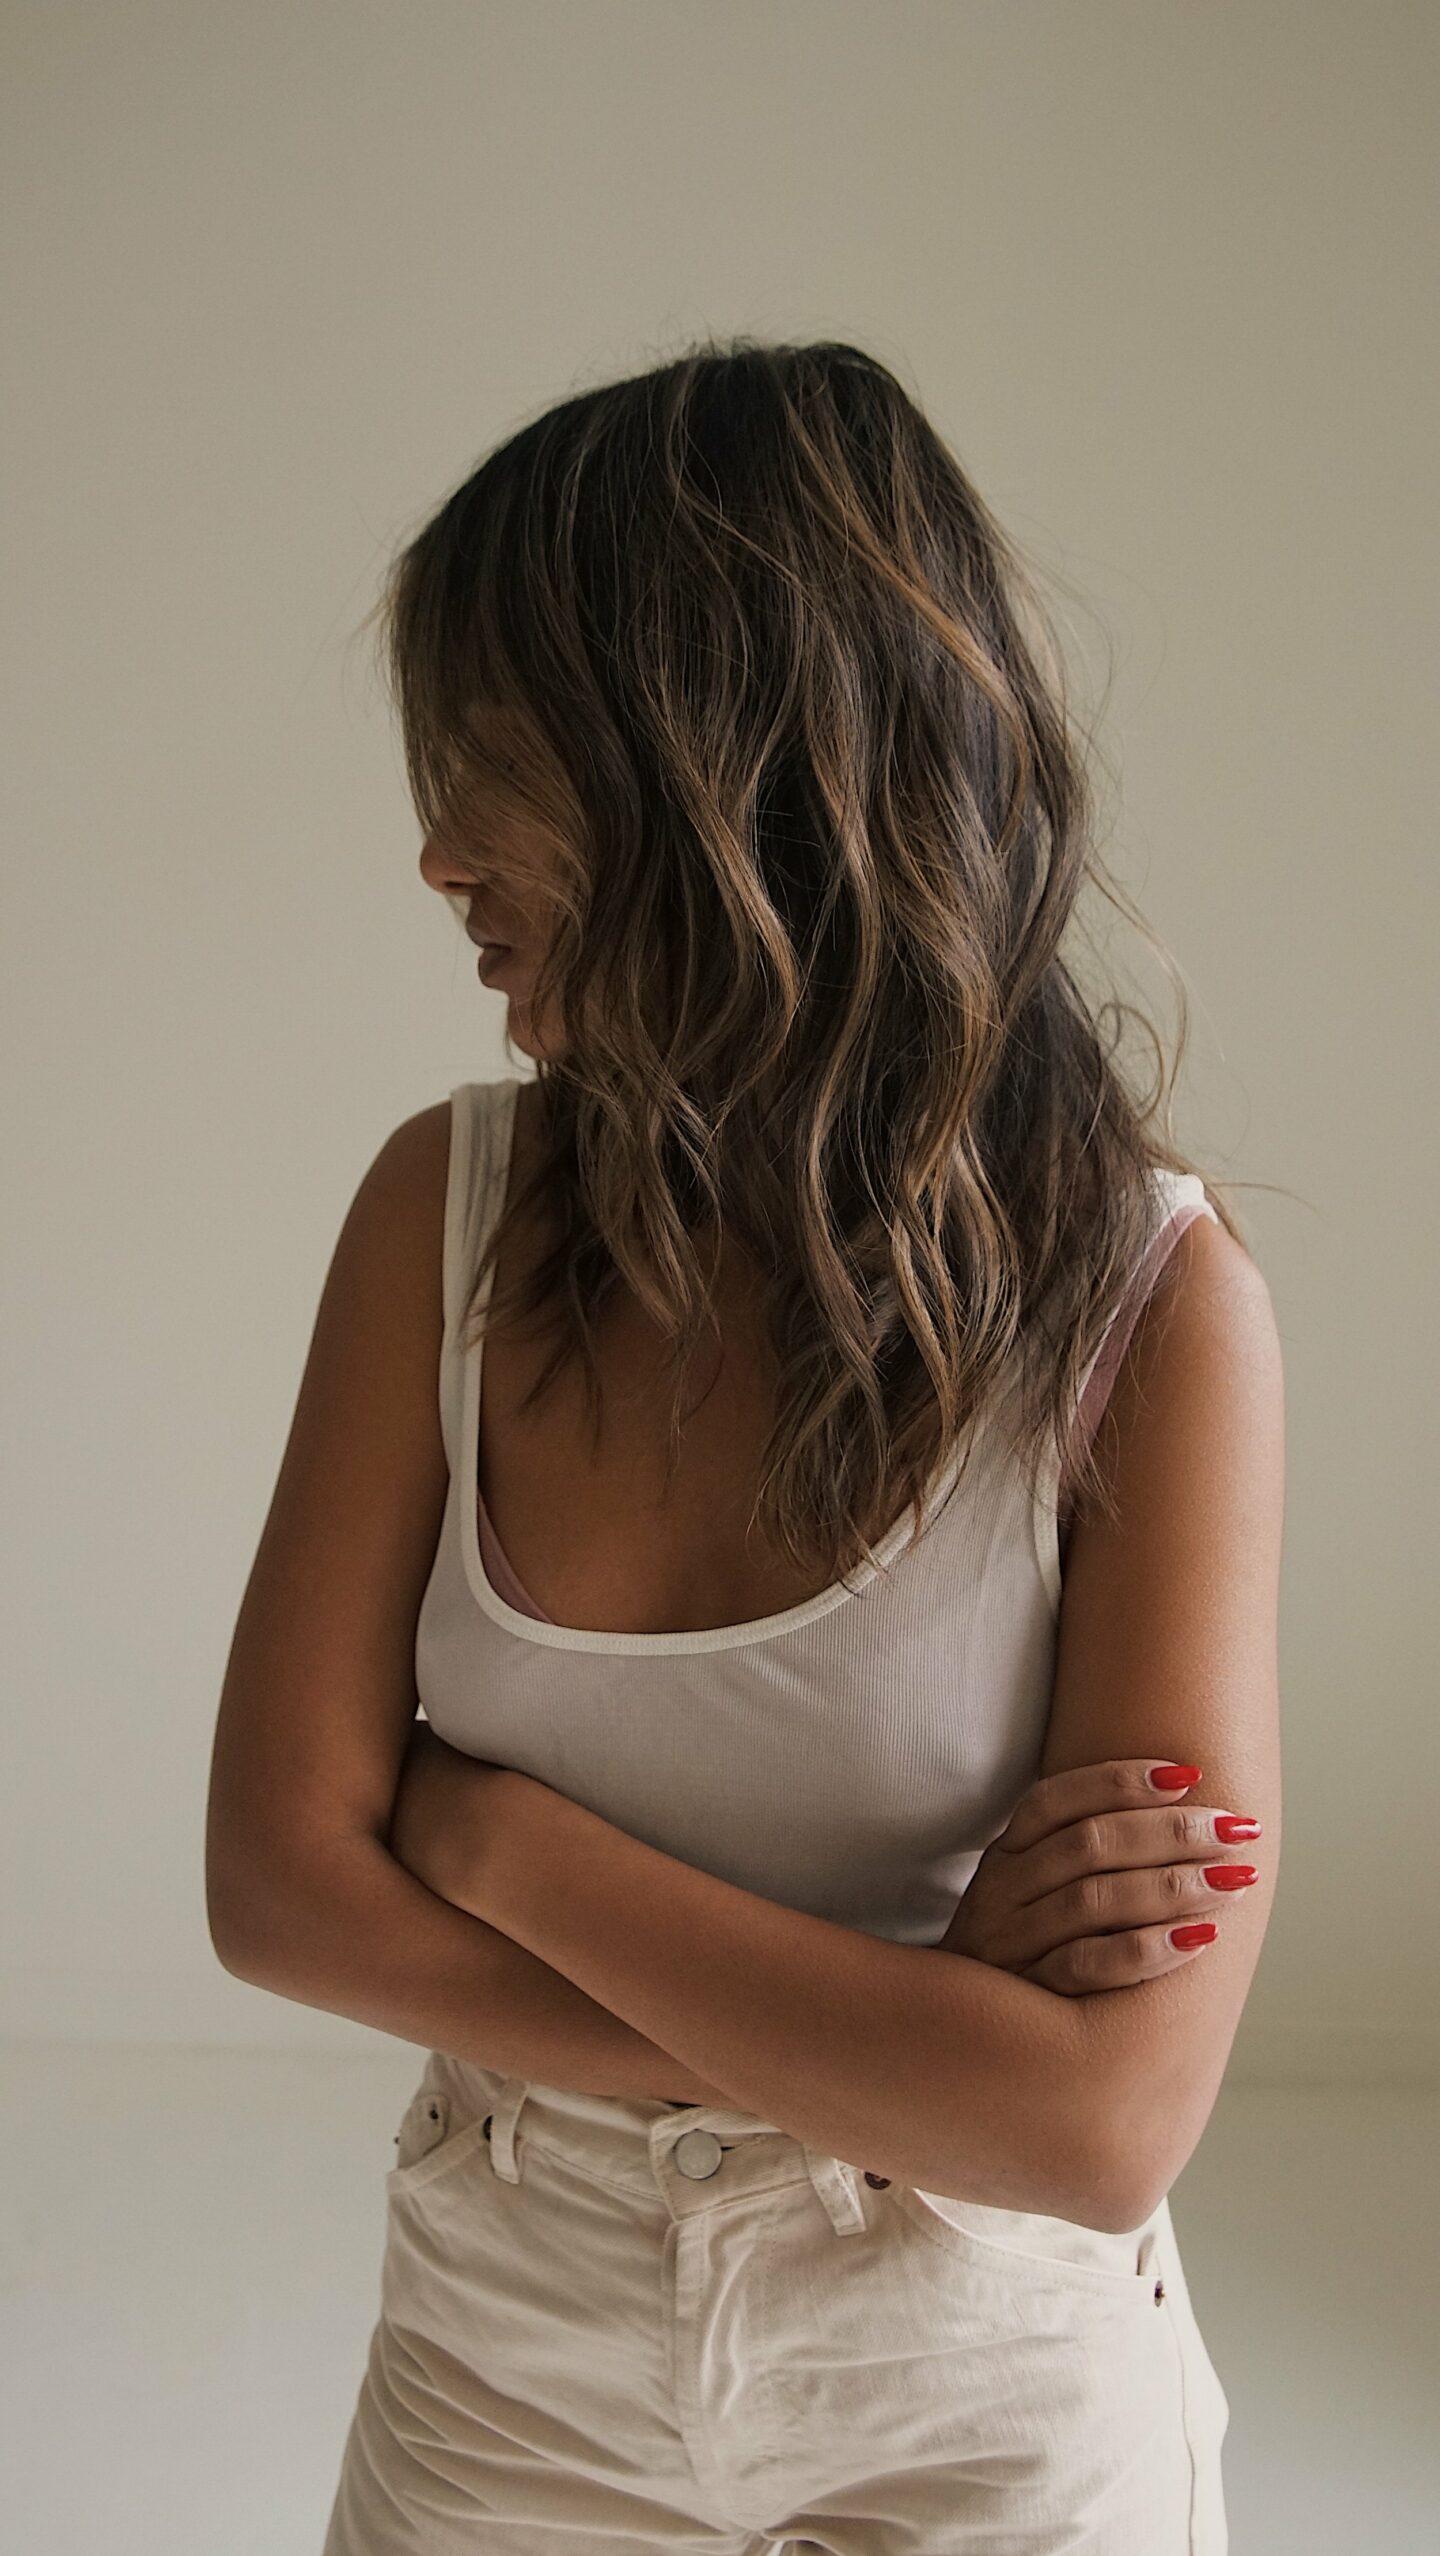 MY HAIR ROUTINE